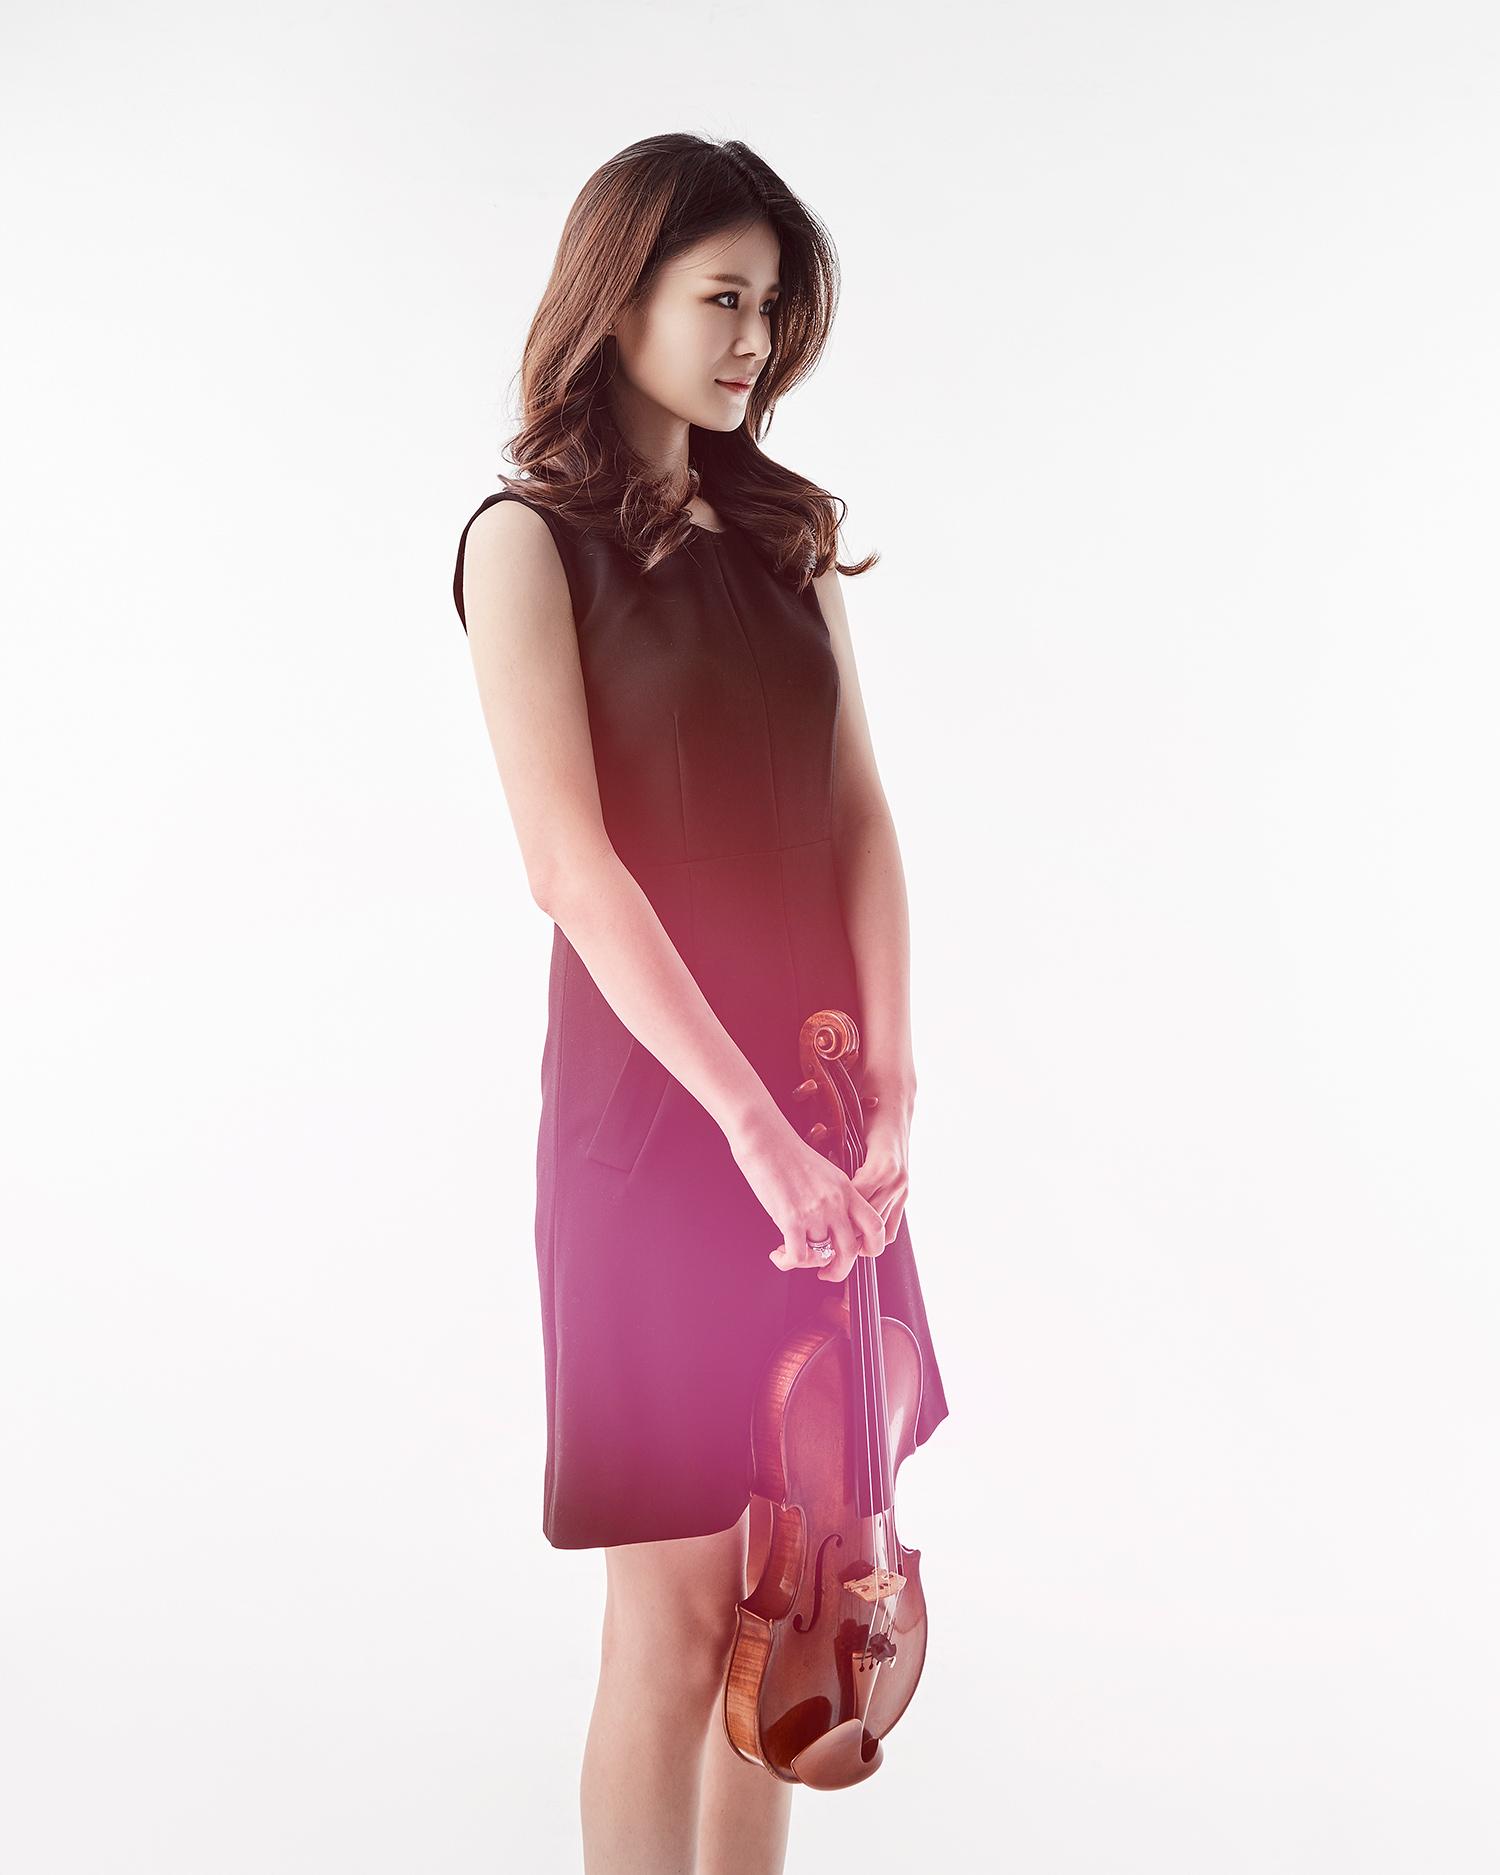 Violinist_홍의연